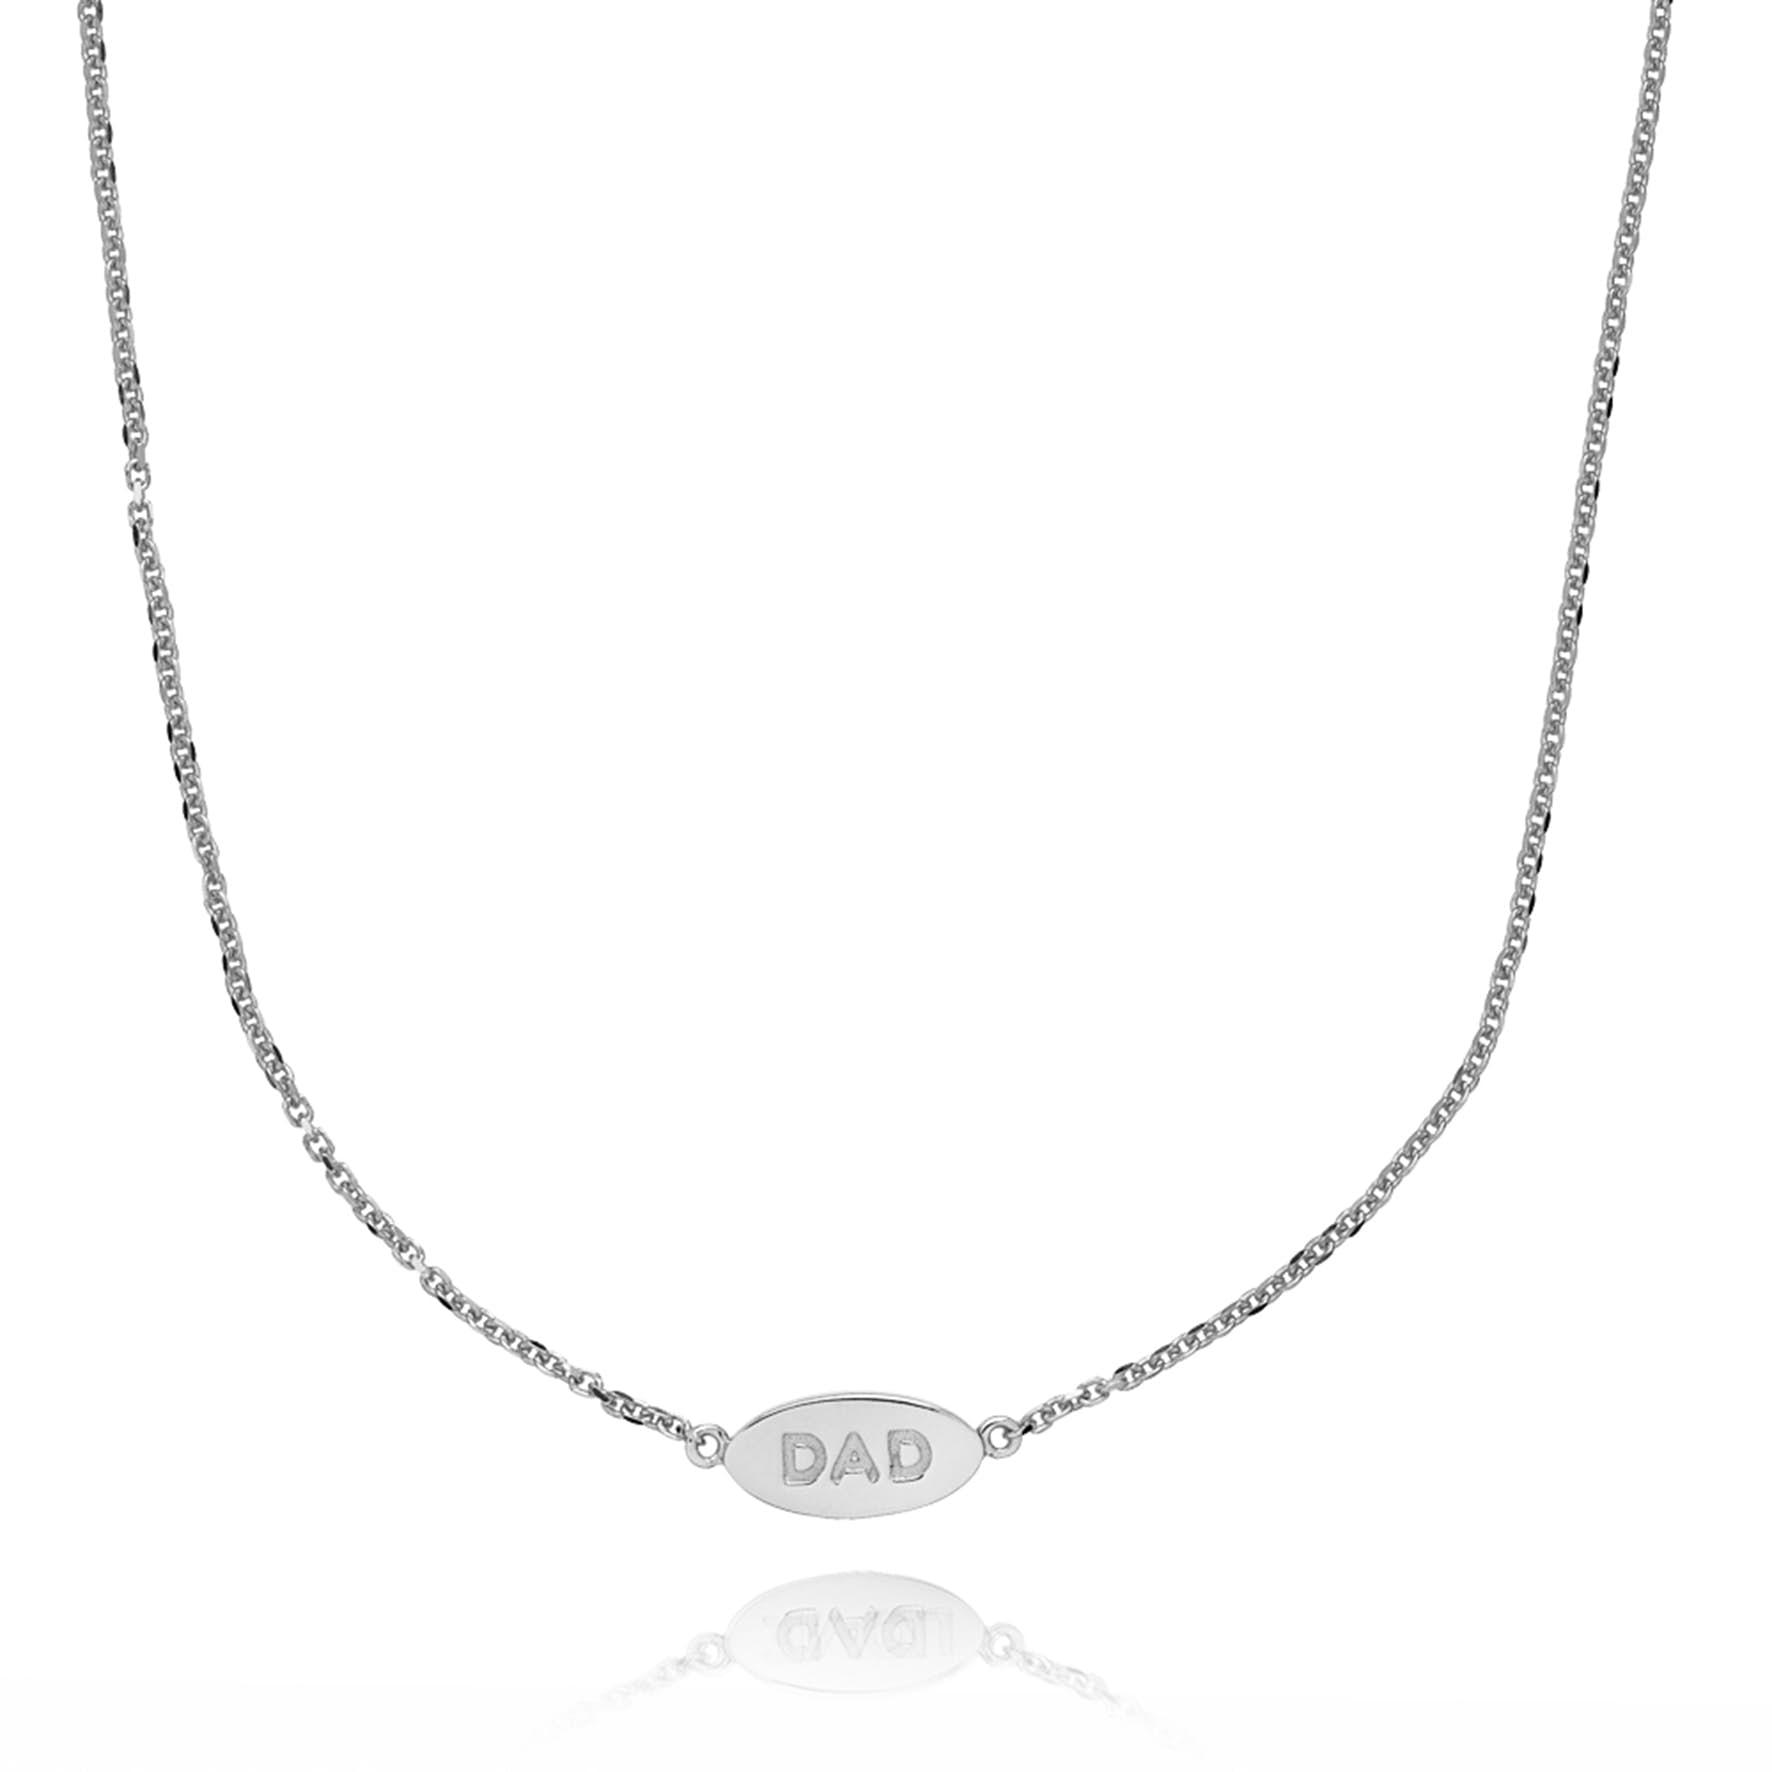 Fam Dad Necklace